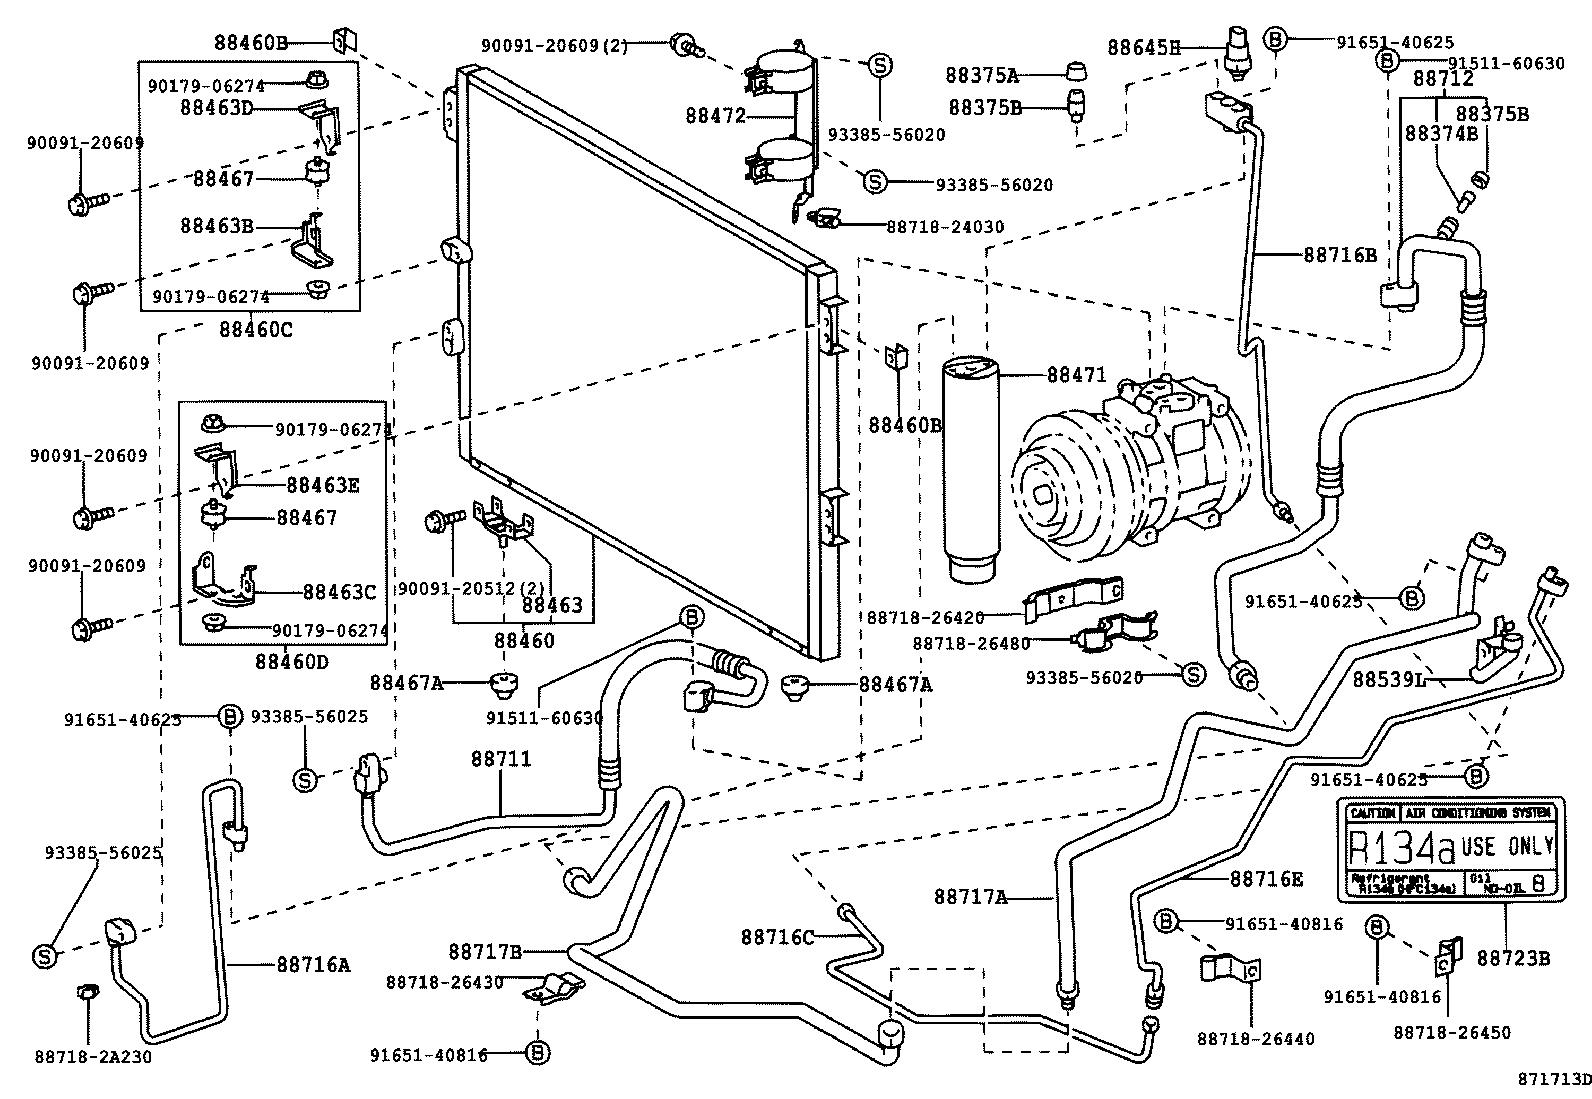 Toyota Townace Wiring Diagram Trusted Diagrams 2002 Rav4l Liteace Ac Auto Electrical U2022 1978 Pickup